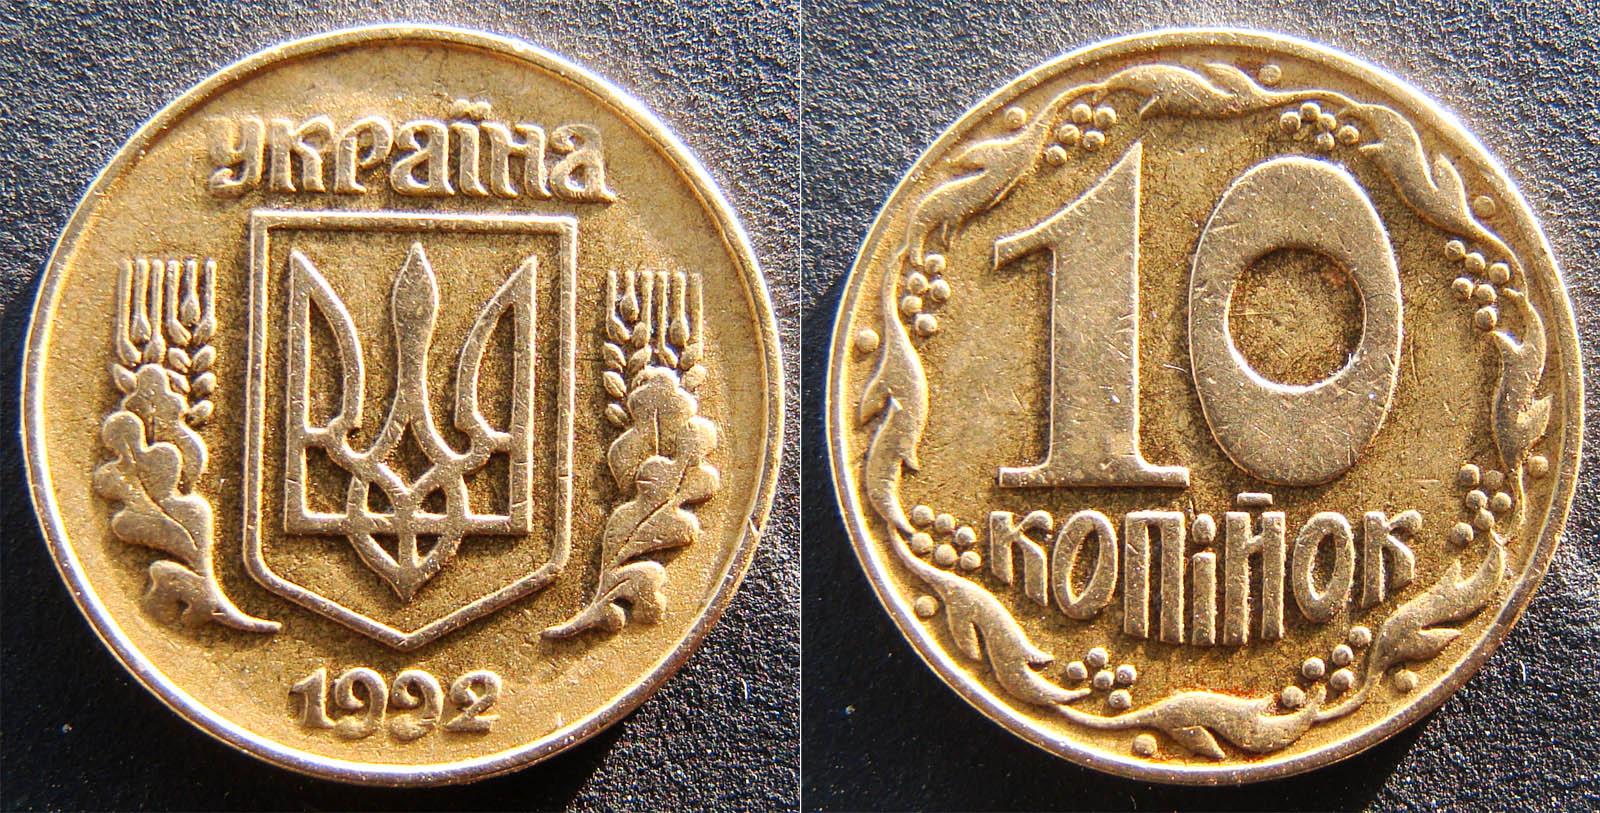 10 копеек 1992 украина цена